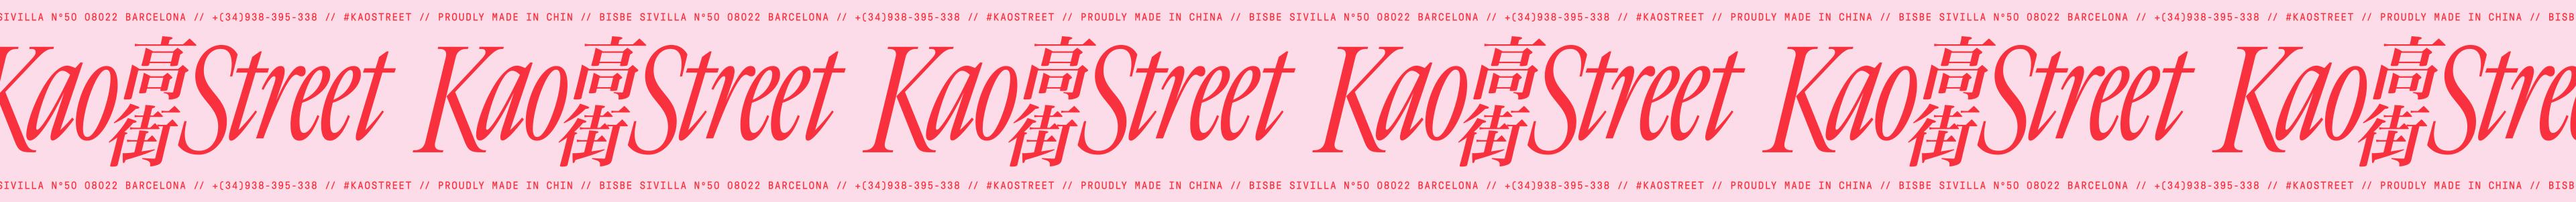 Kao Street